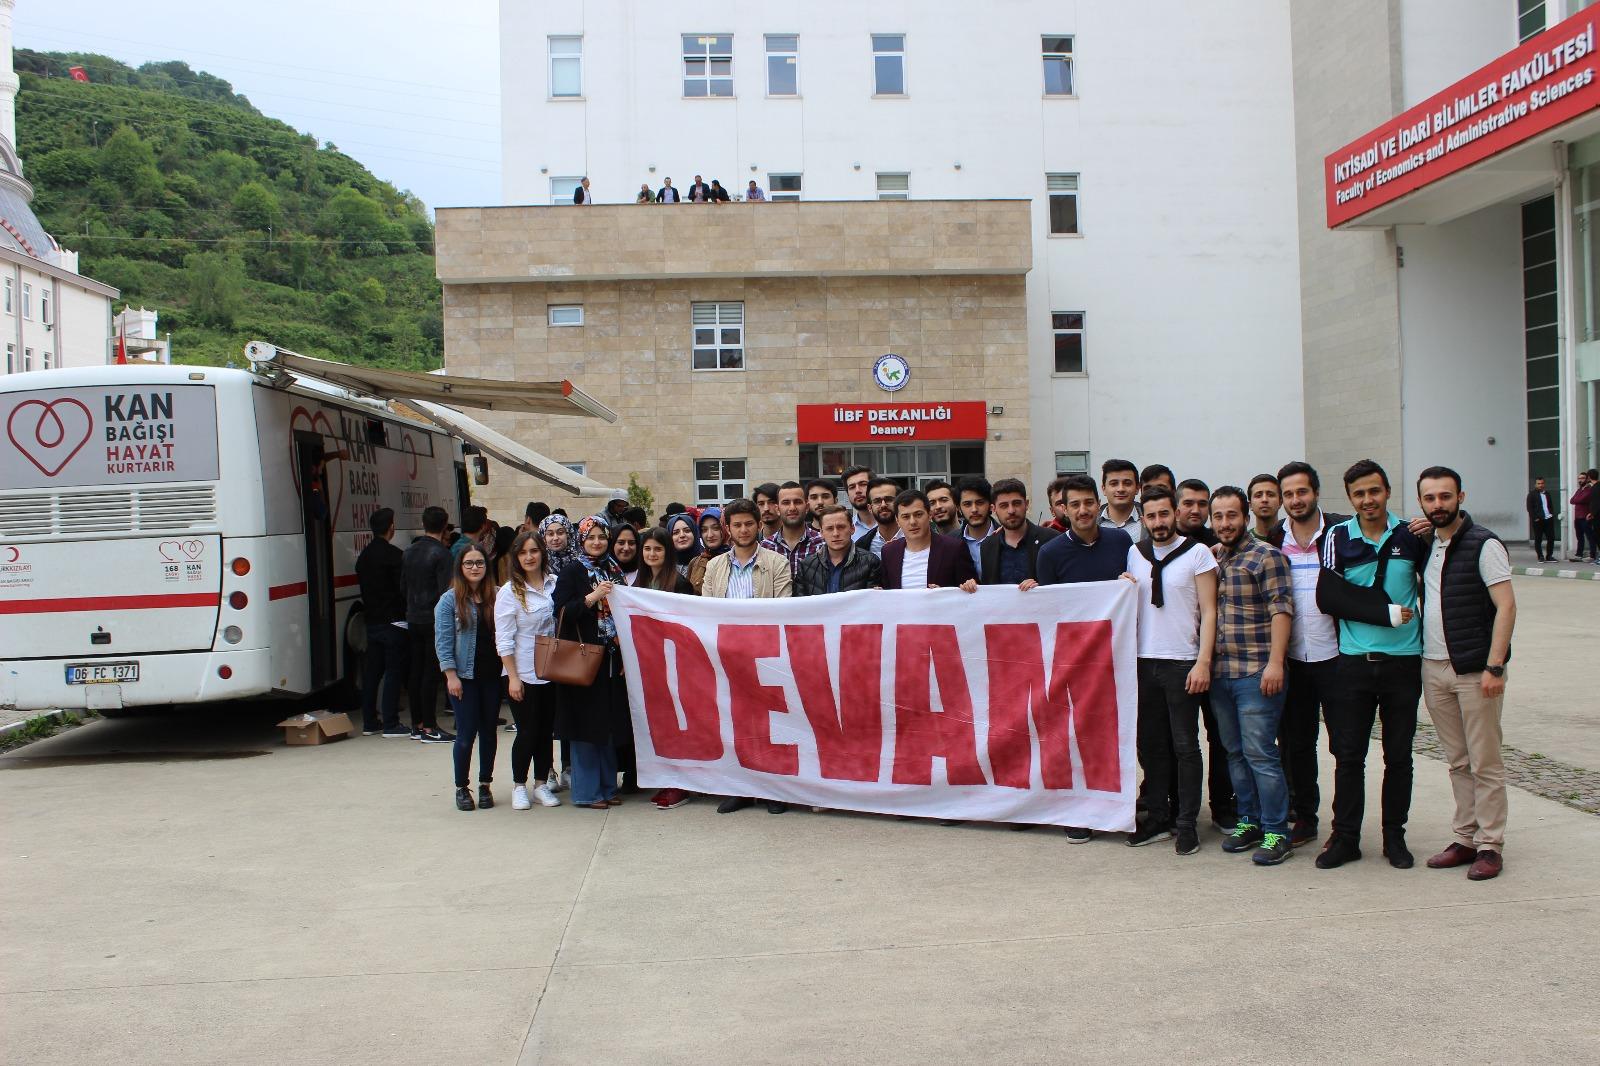 AK Partili Gençlerden Kan